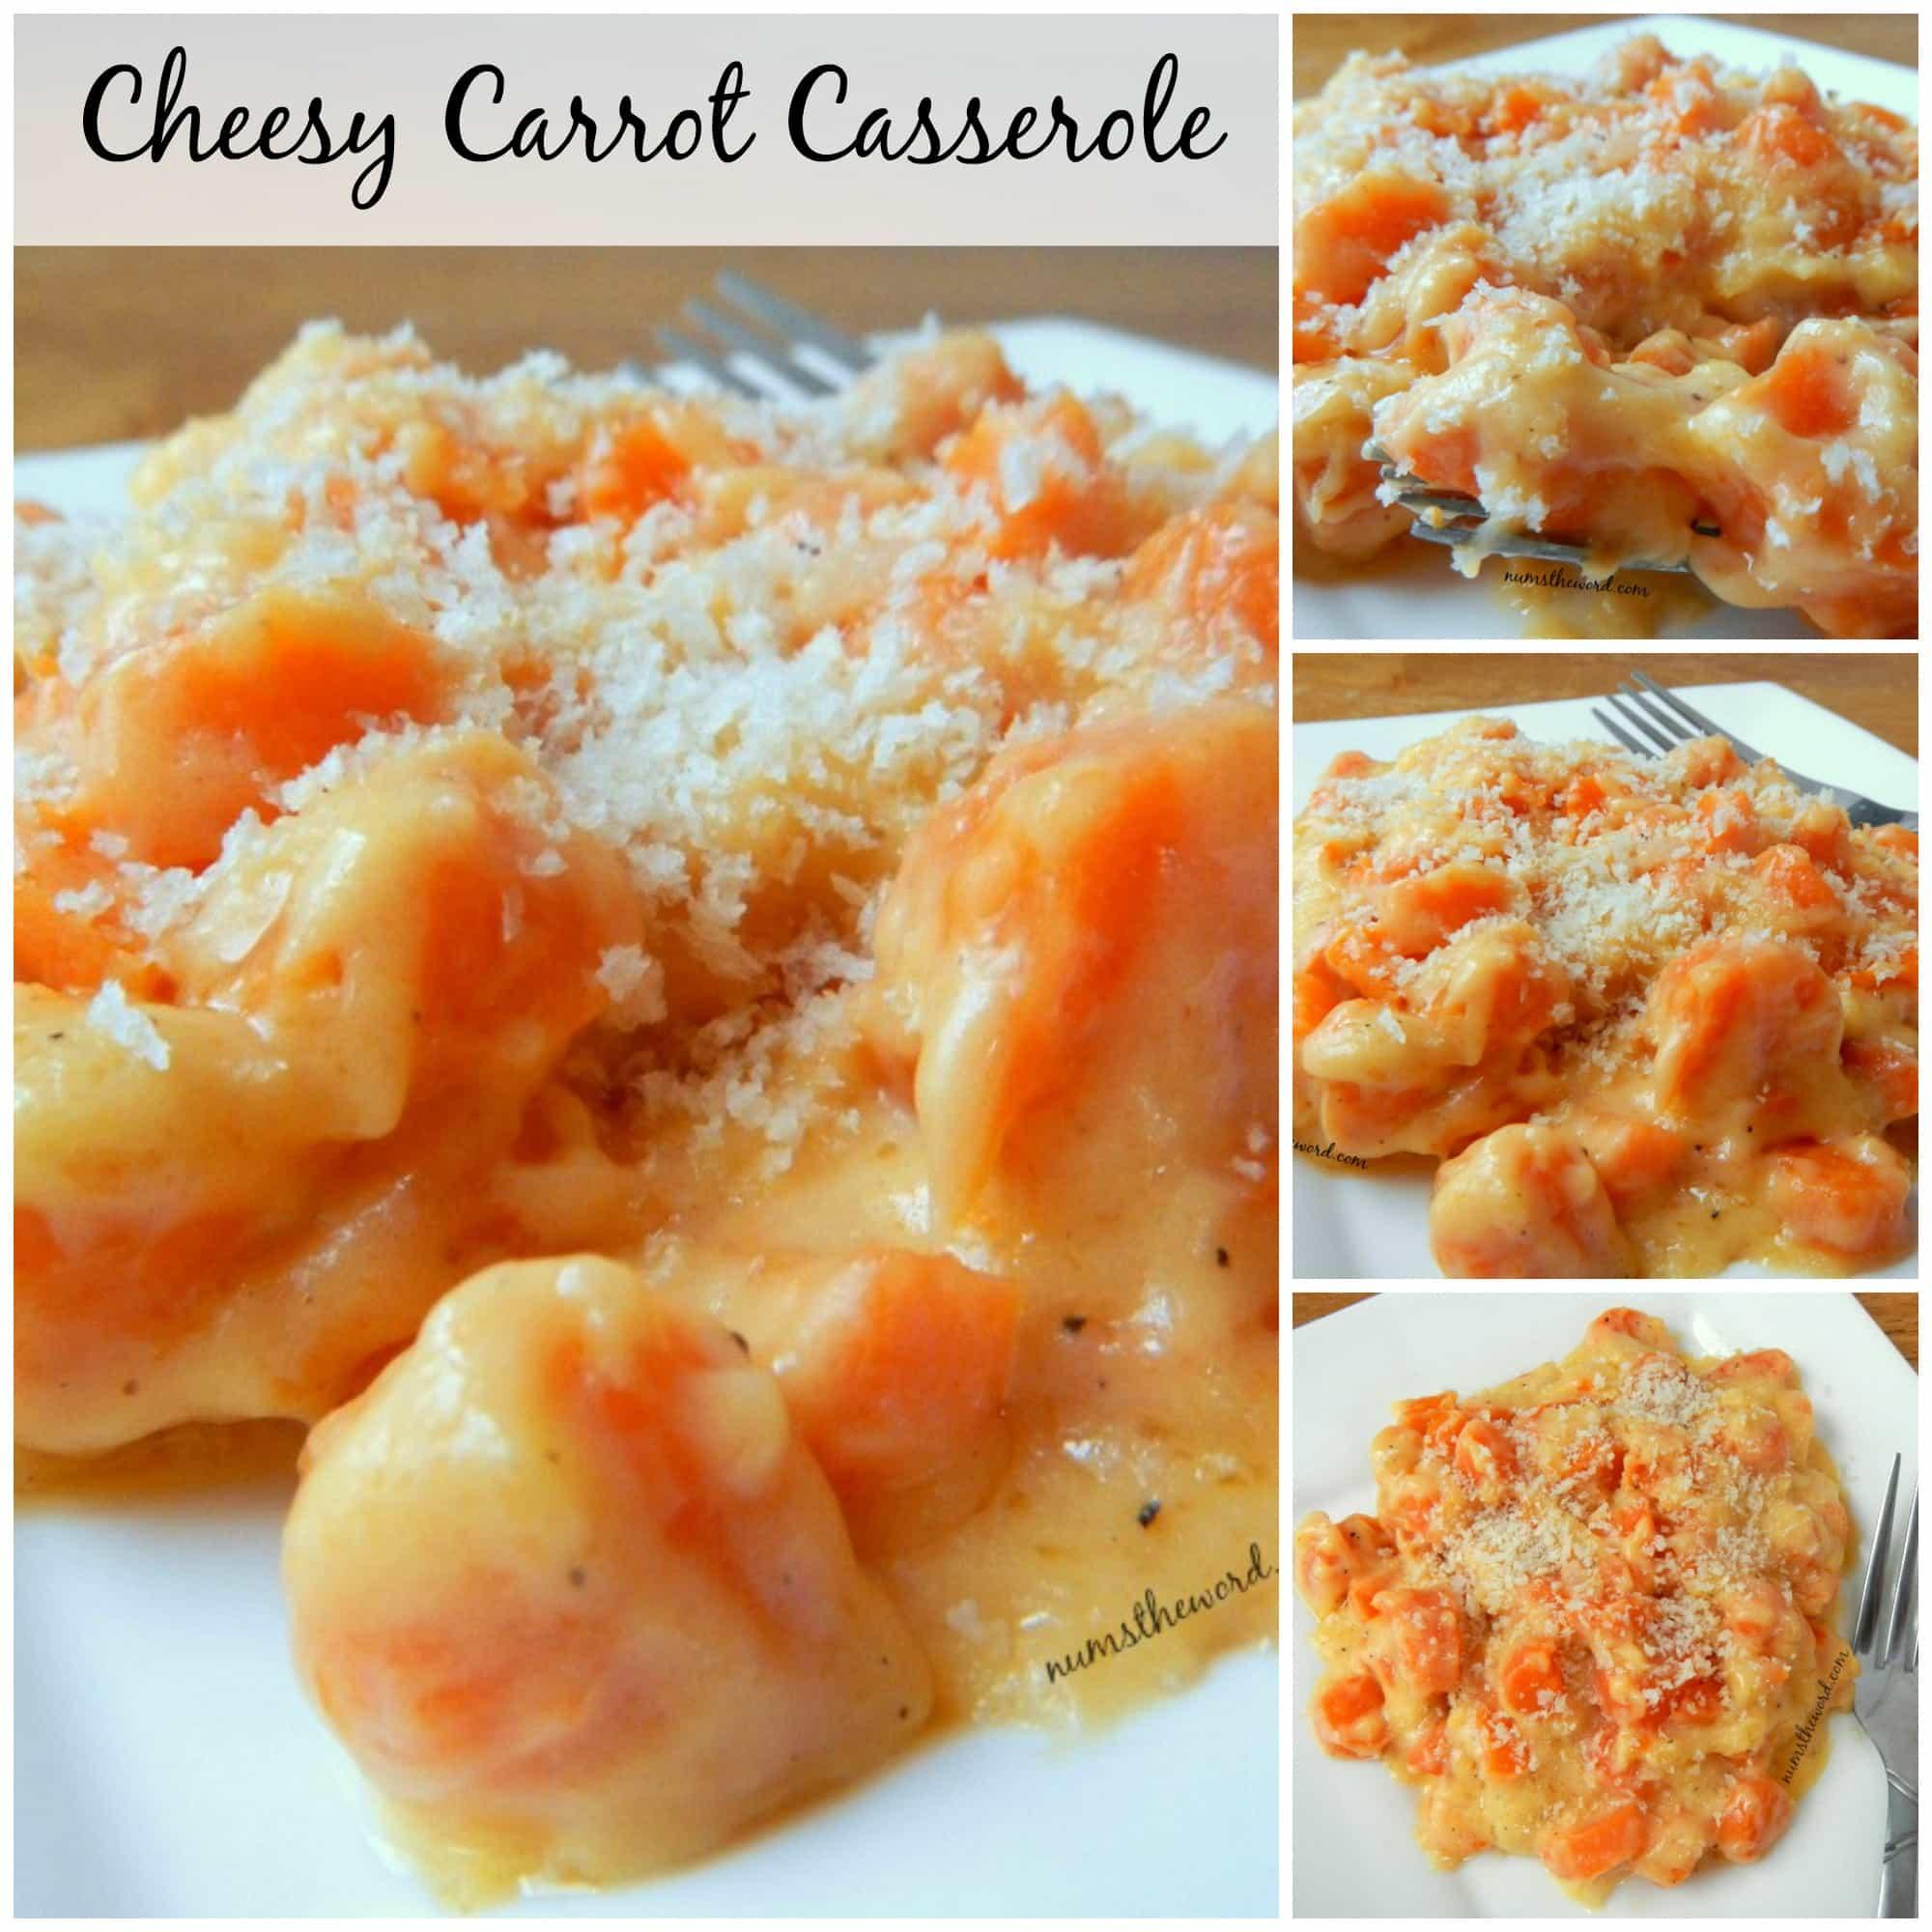 Cheesy Carrot Casserole - Facebook collage of photos